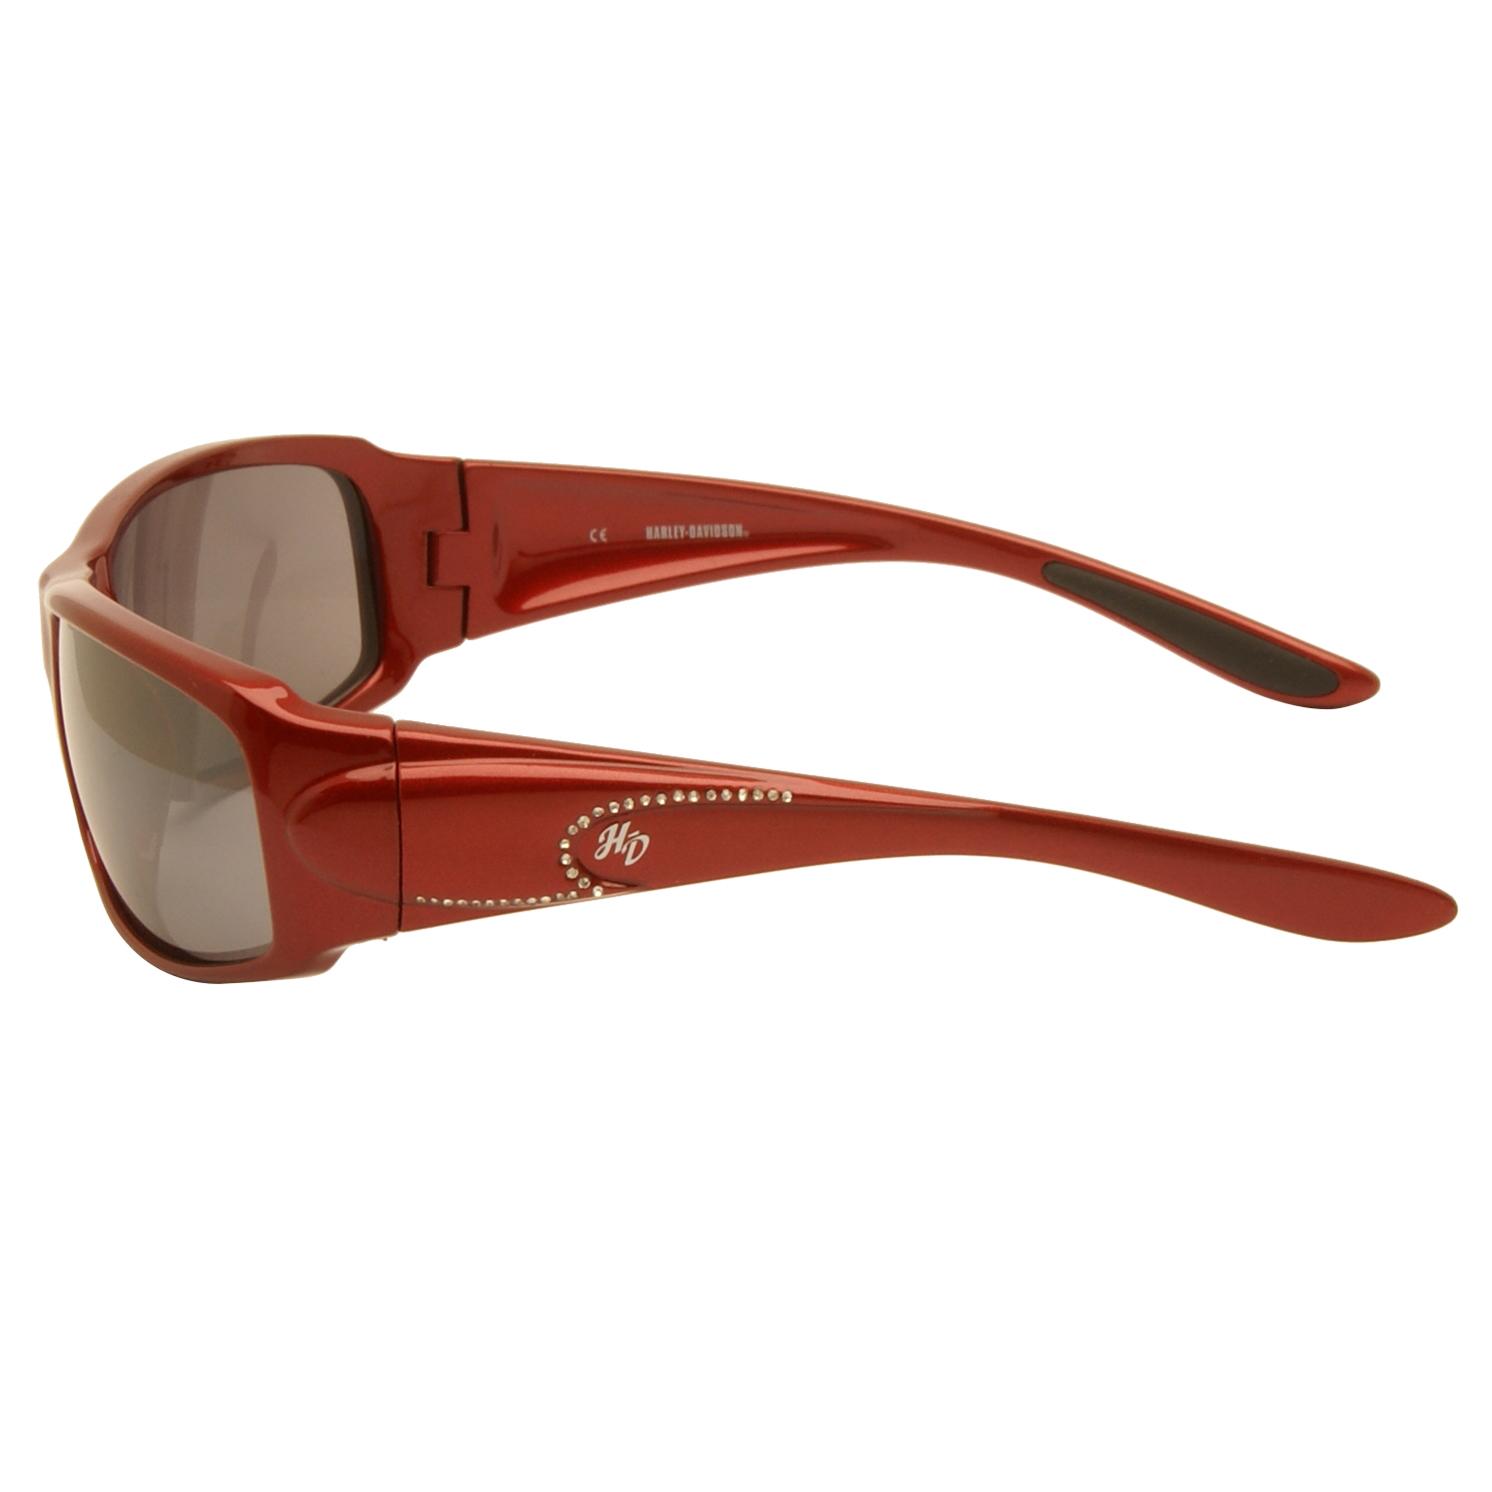 Harley Davidson – Shiny Red & Diamante Wraparound Style Sunglasses with Case